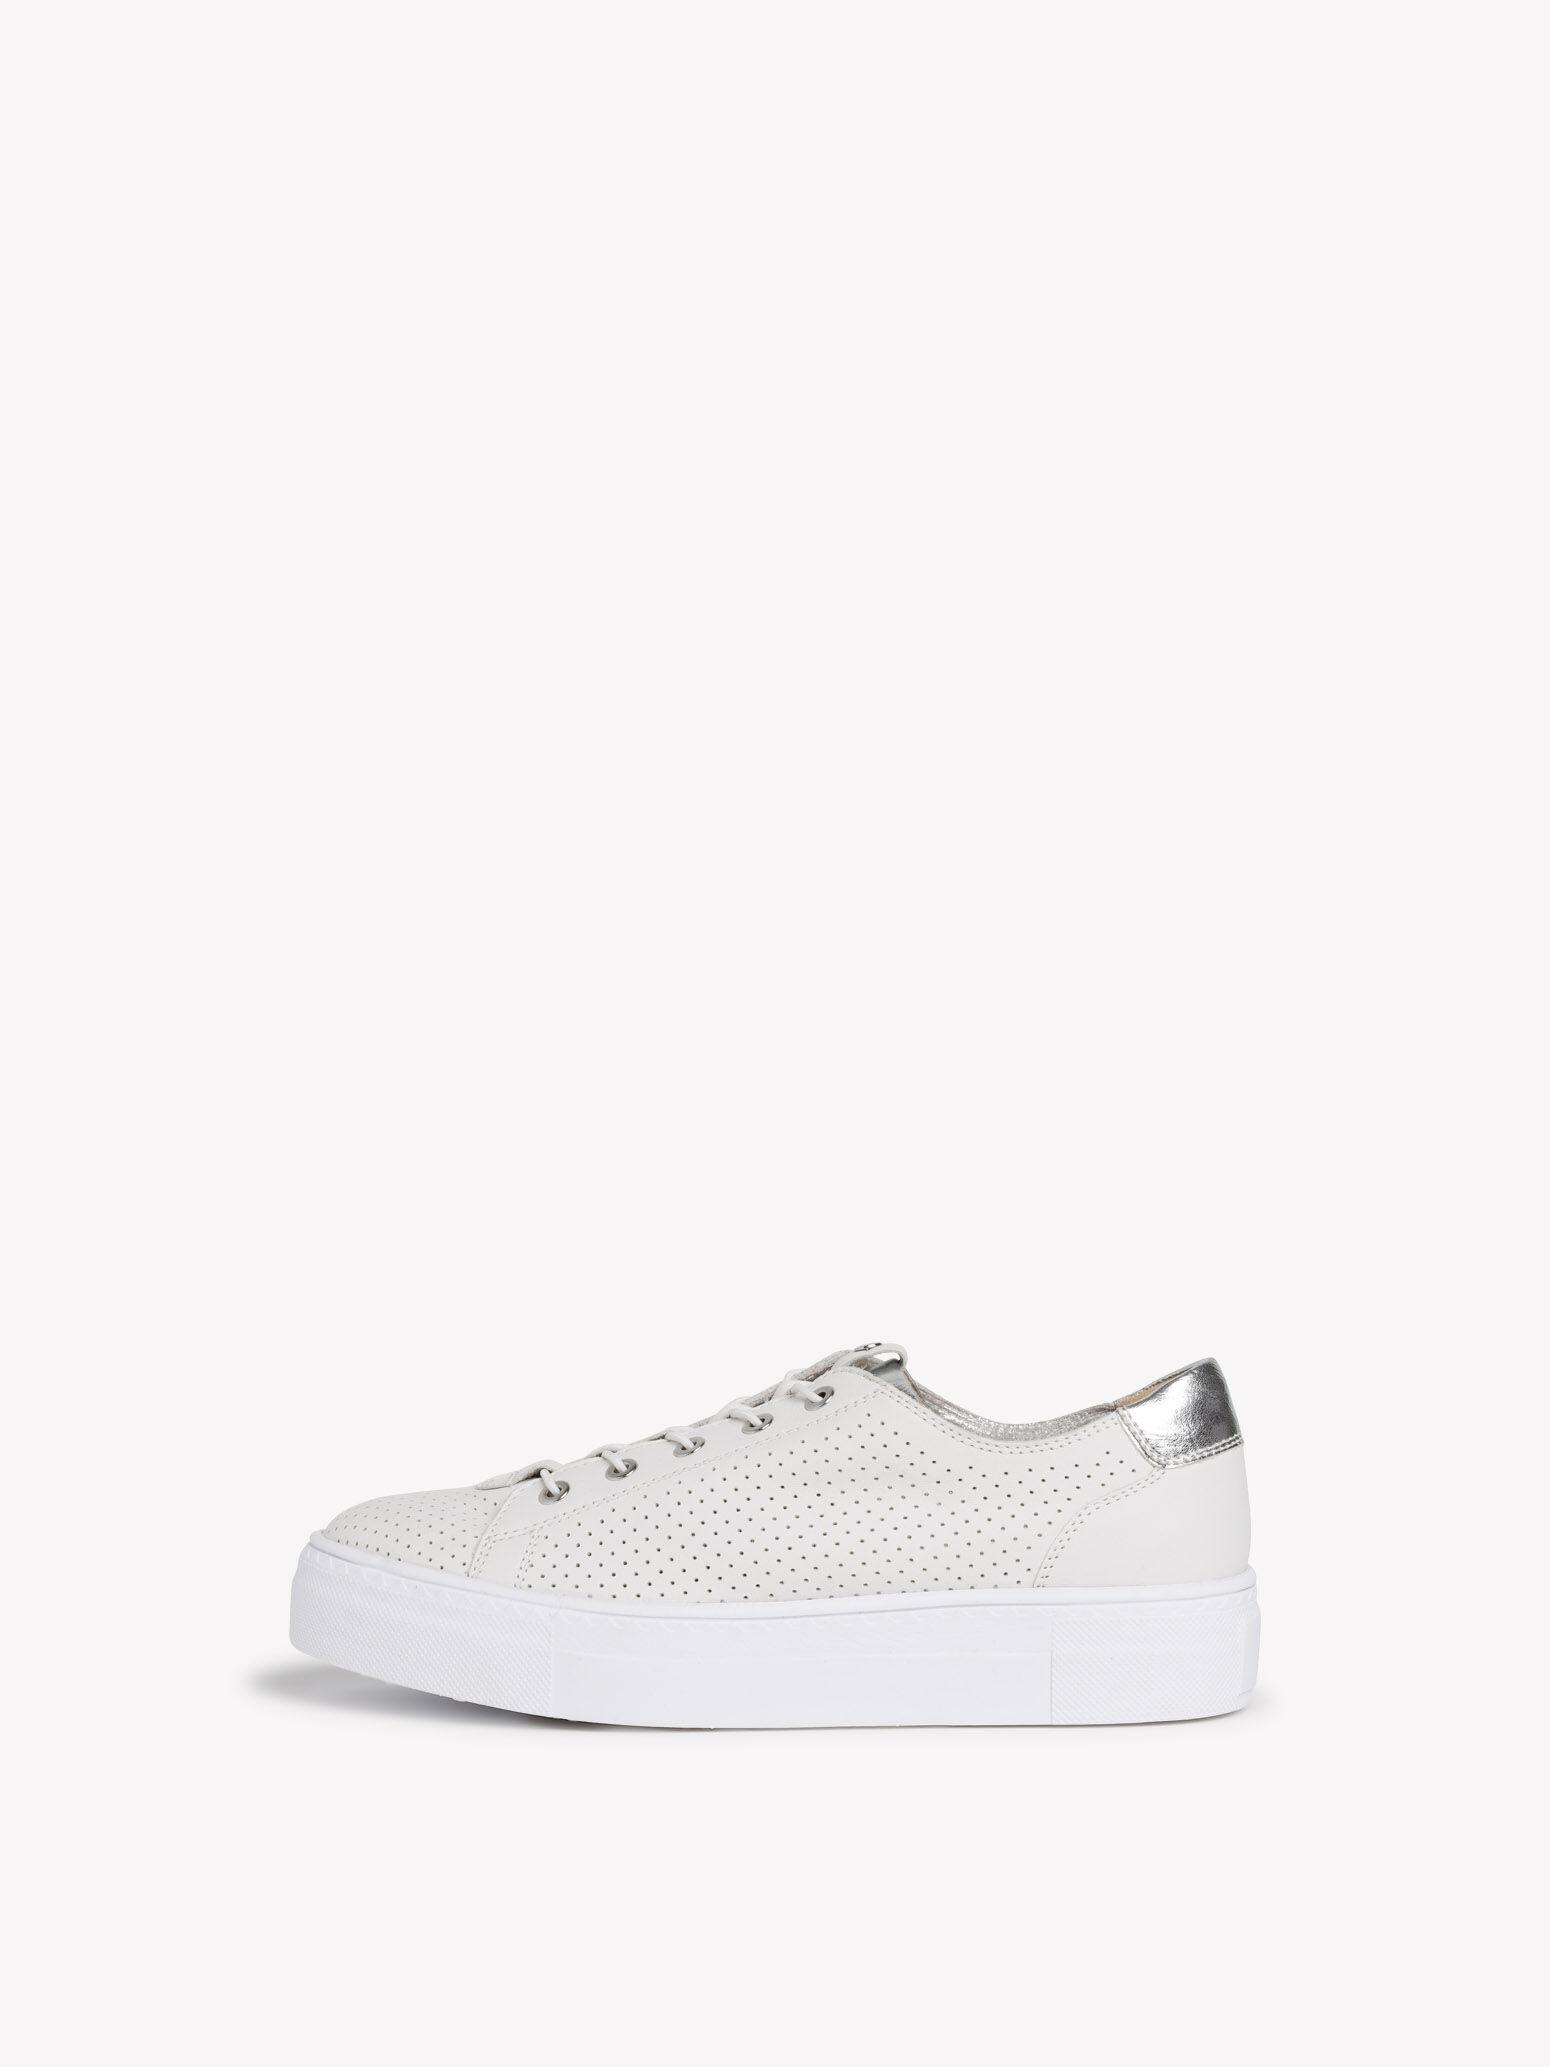 tamaris sneakers white